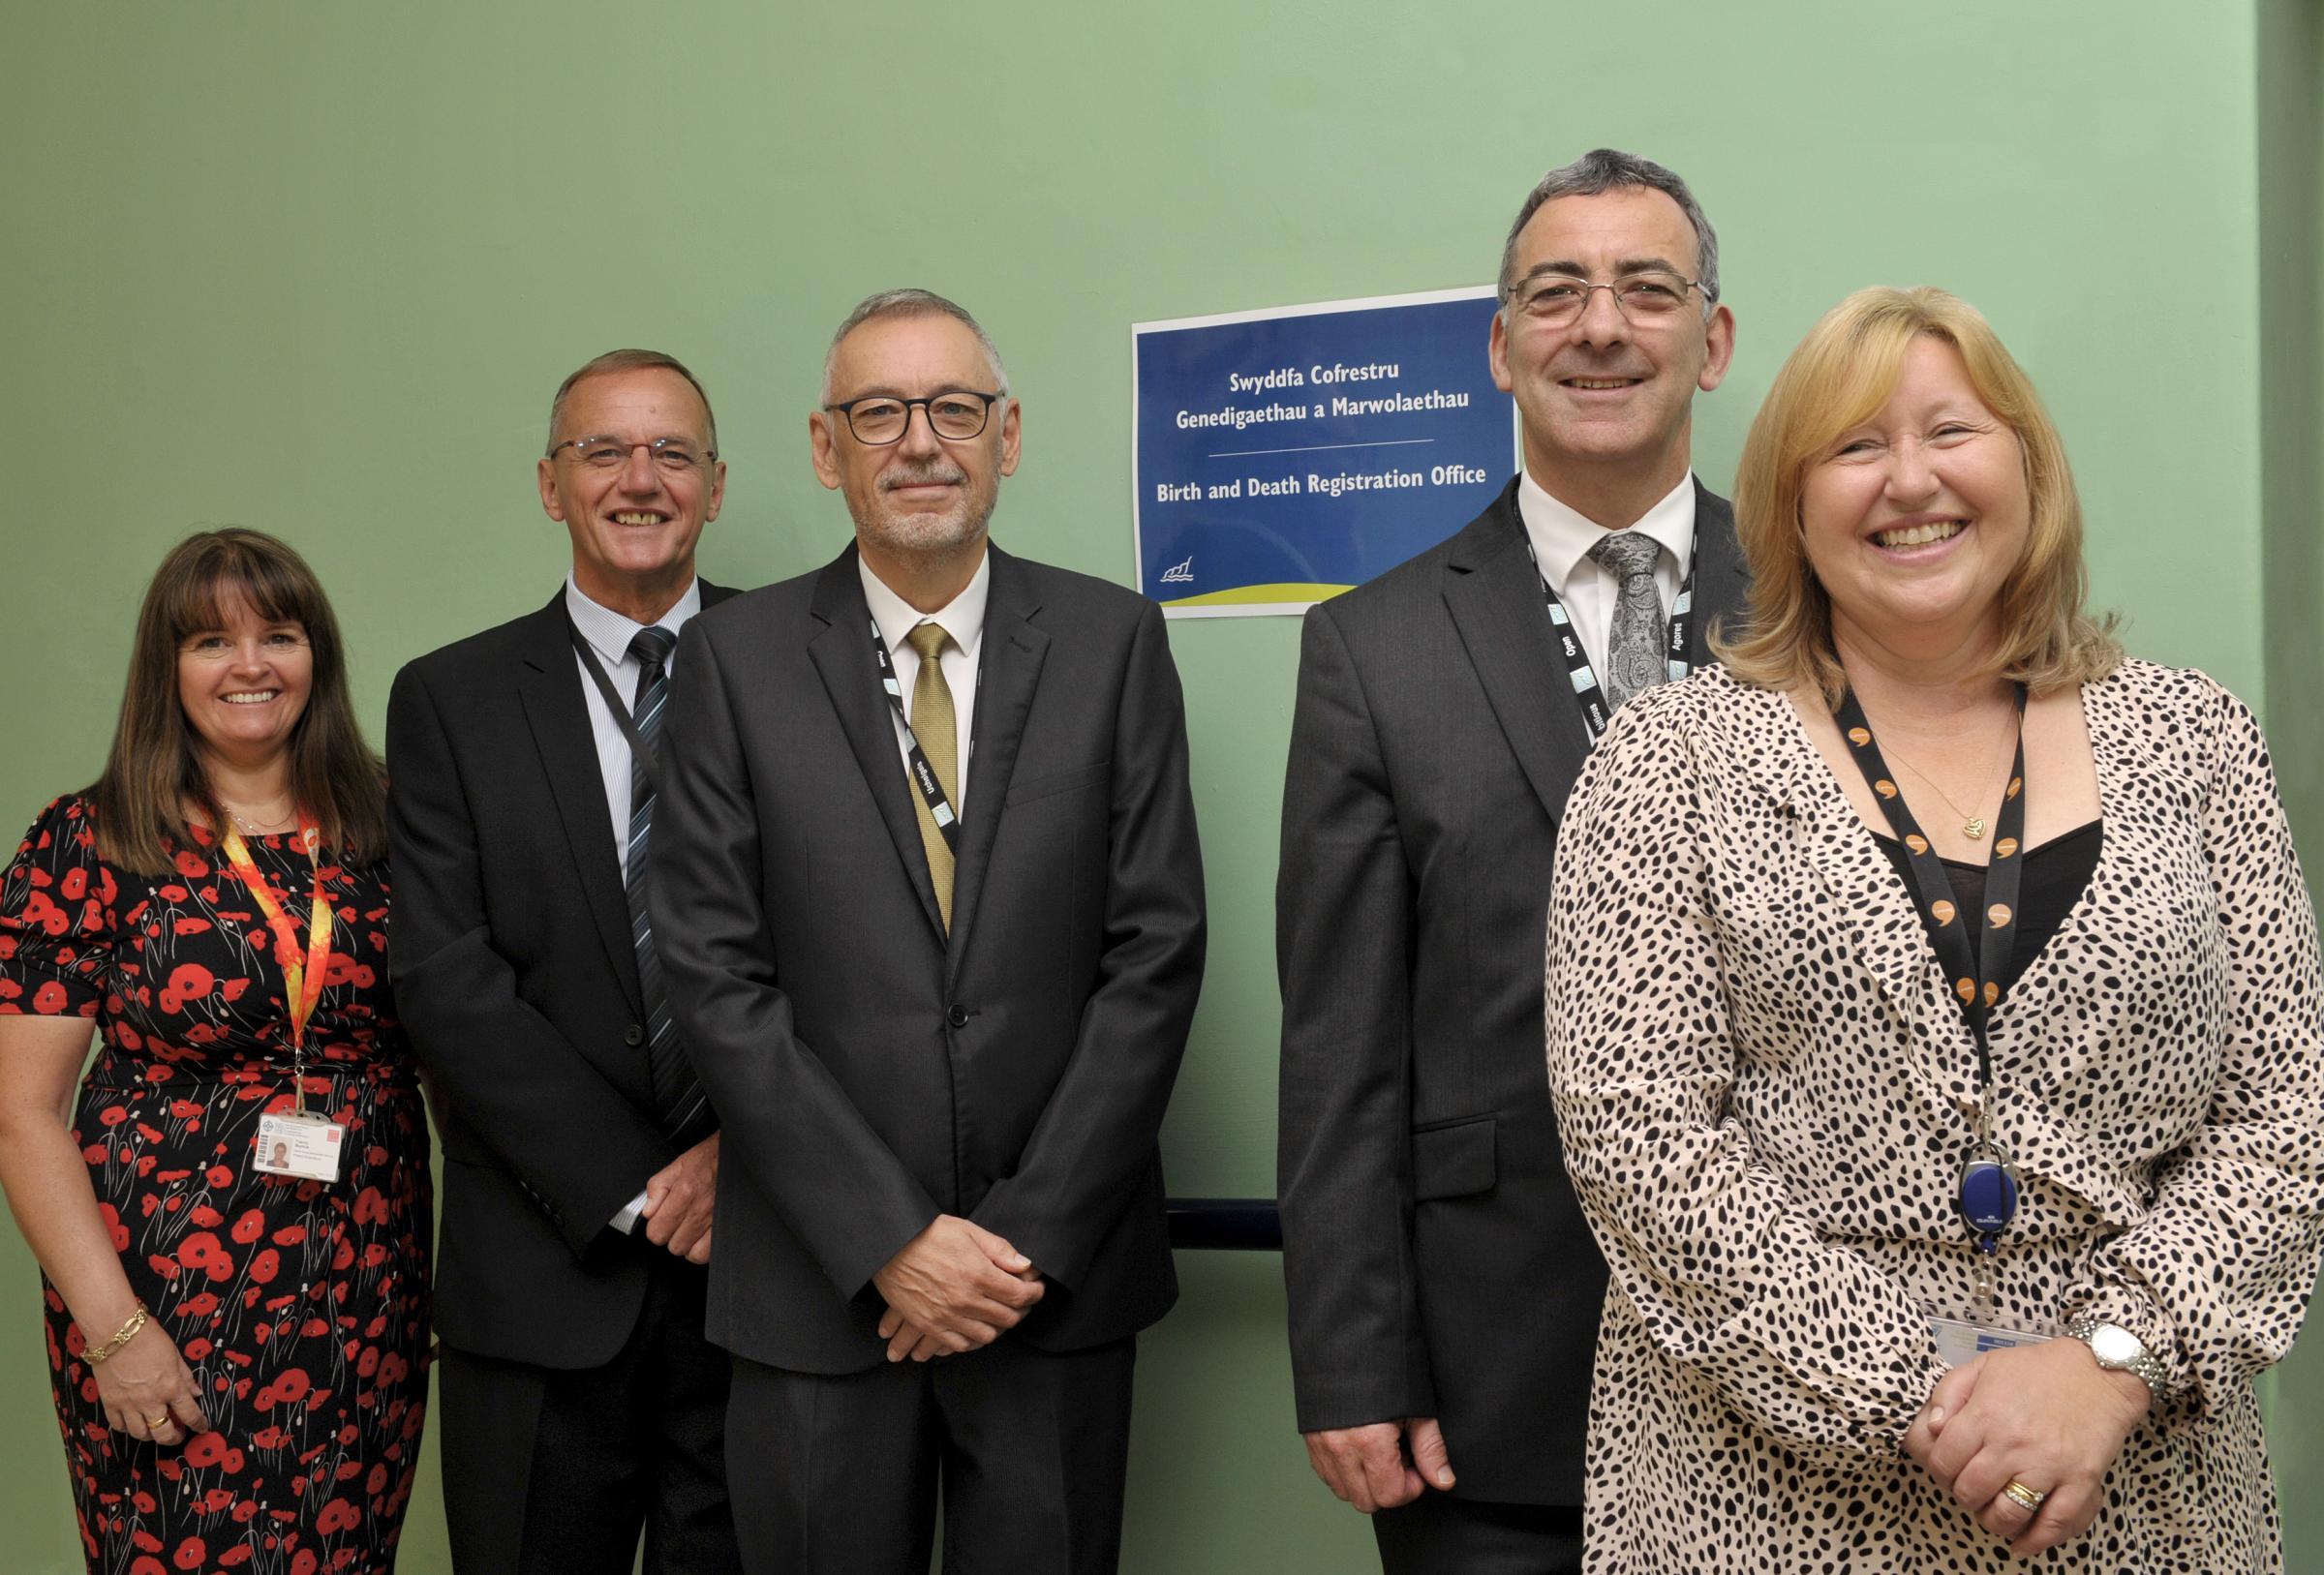 Registration office at University Hospital Llandough now a permanent fixture